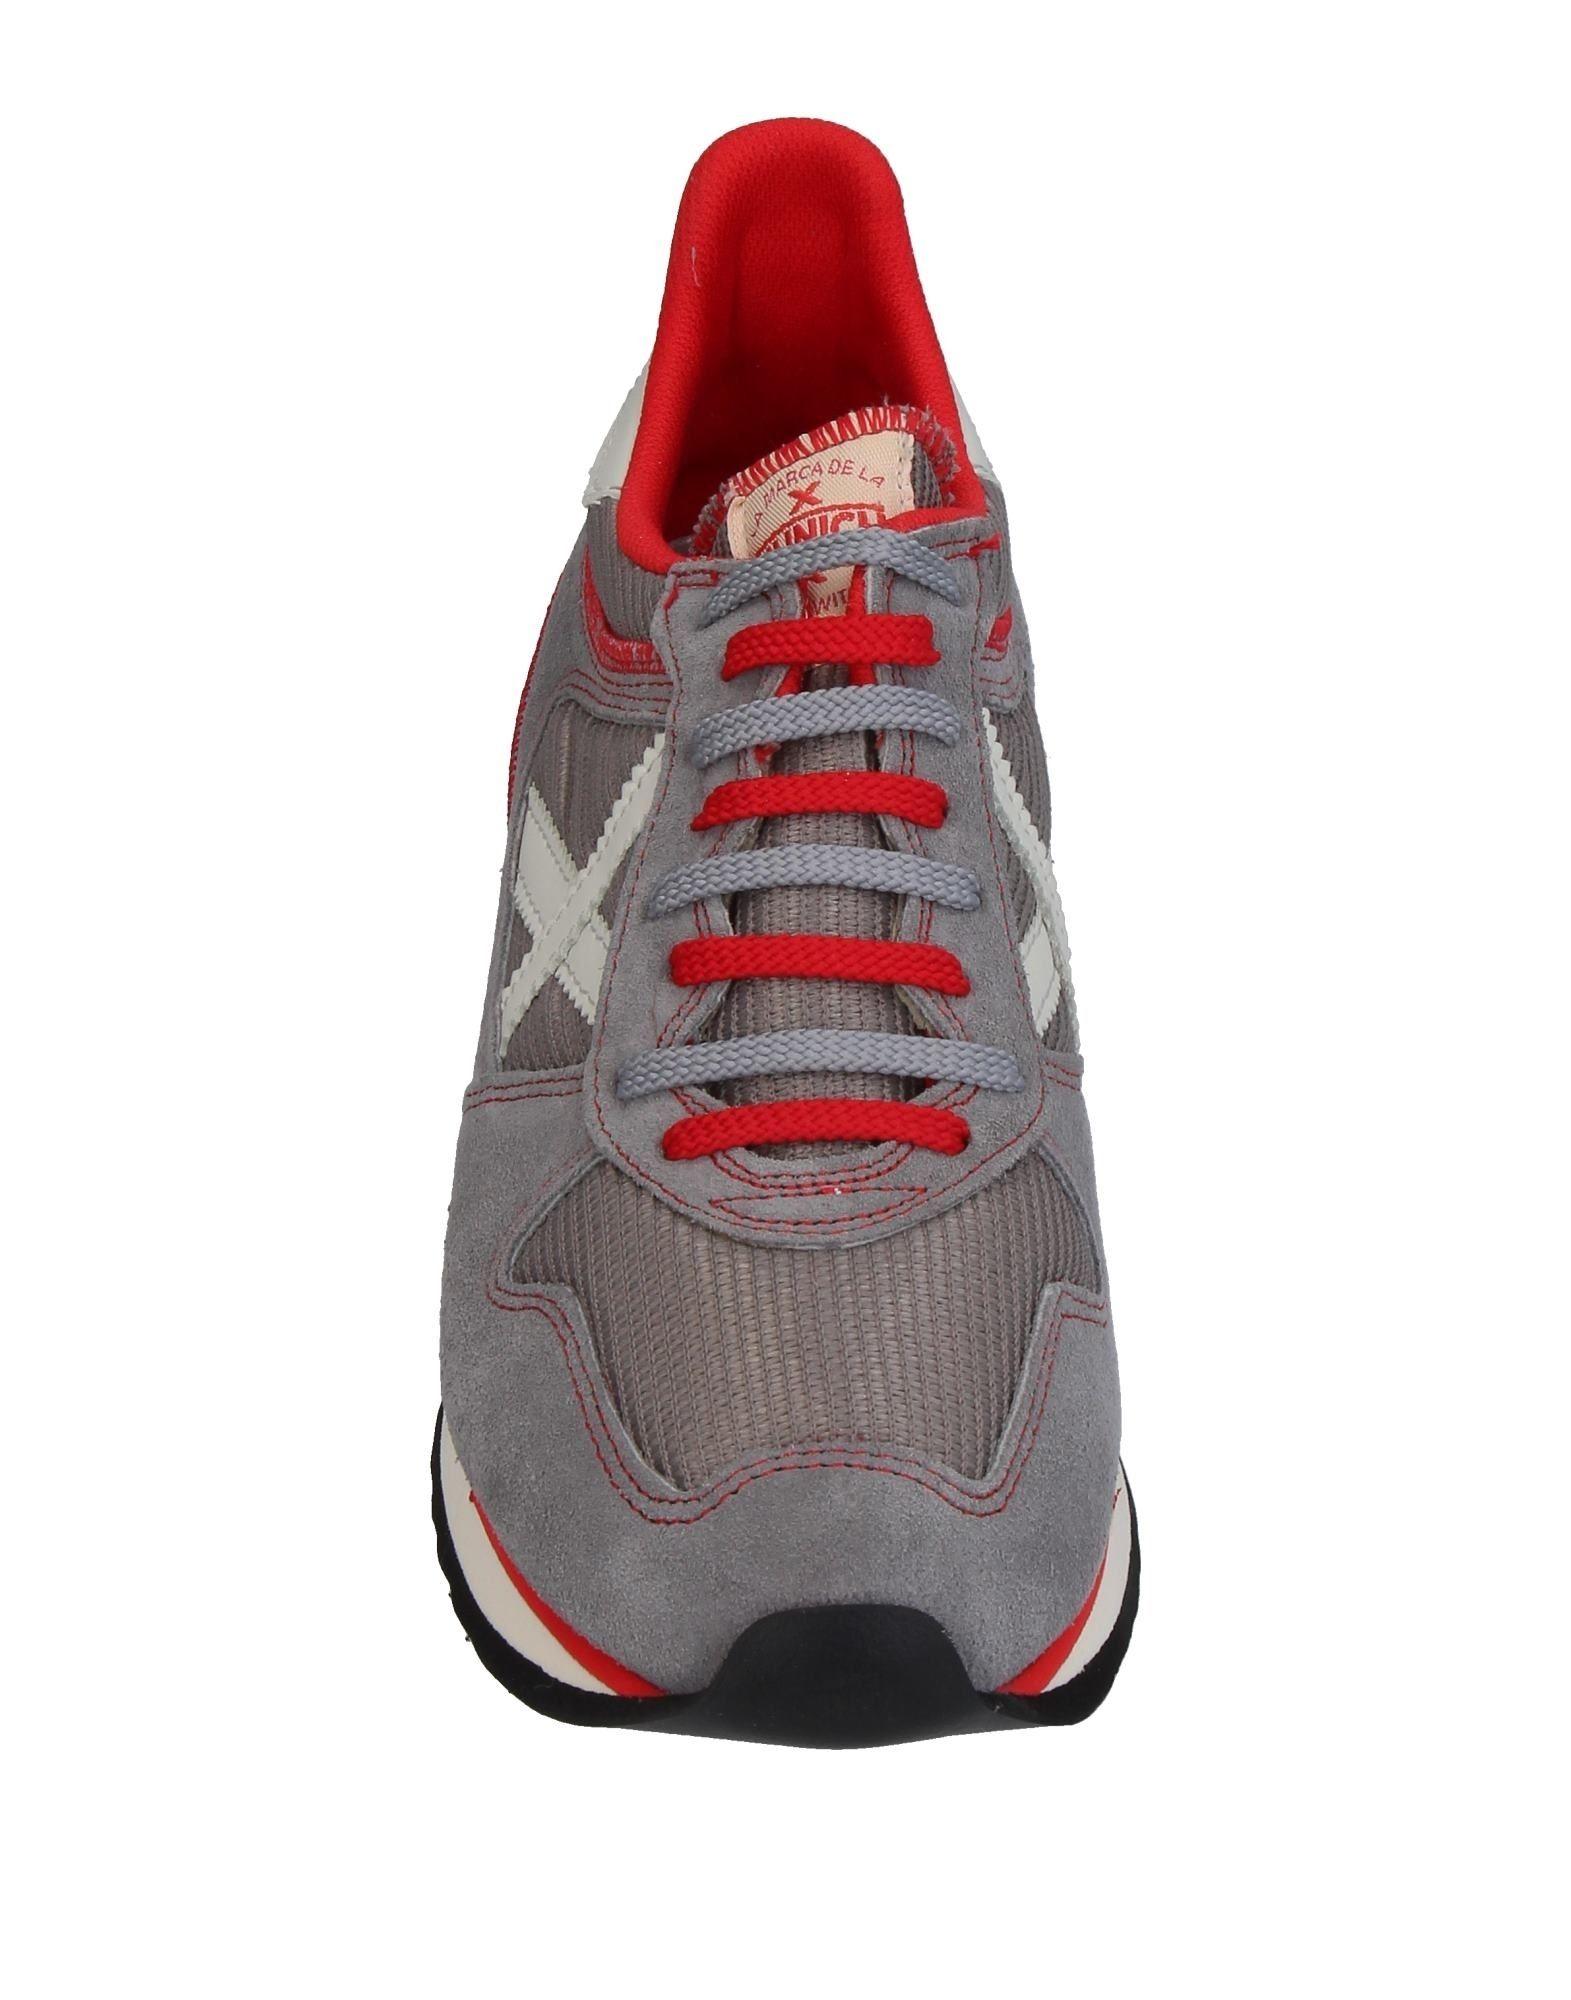 Rabatt echte Schuhe Munich Sneakers 11412864GW Herren  11412864GW Sneakers fa7d5d